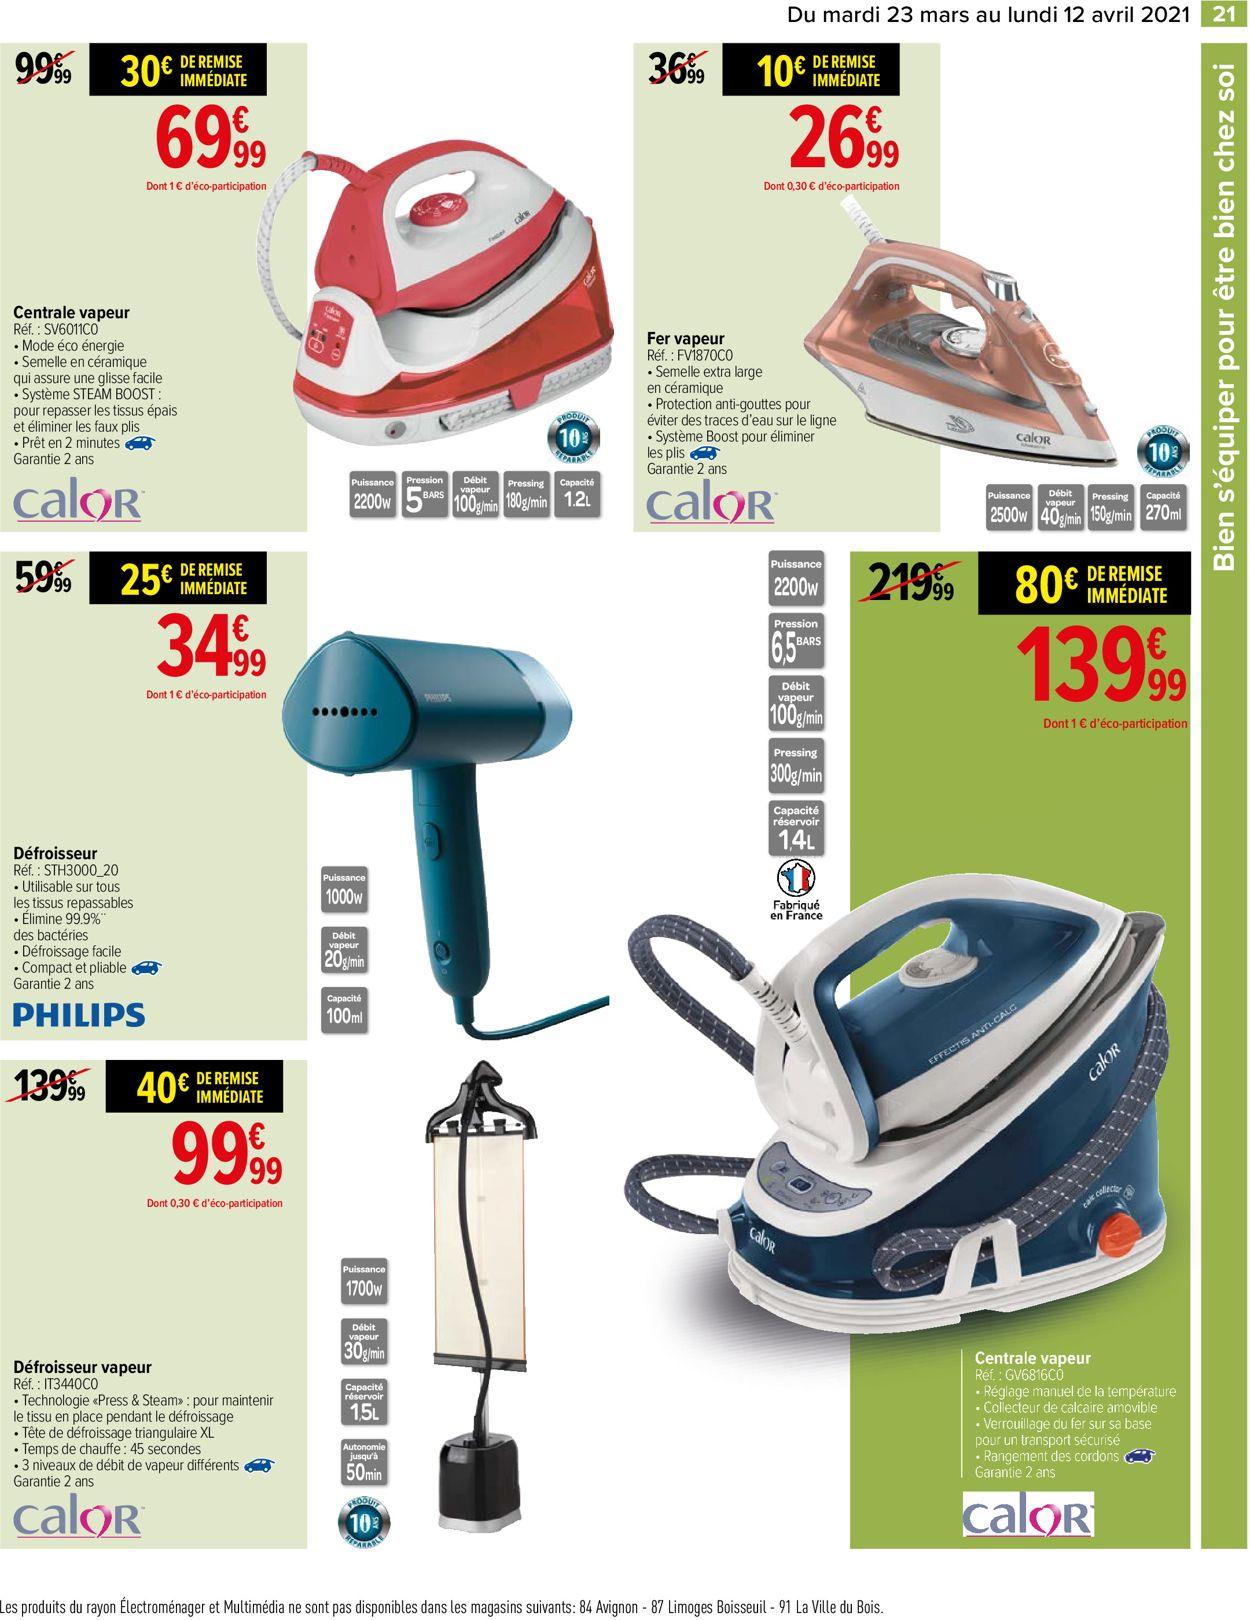 Carrefour Catalogue - 23.03-12.04.2021 (Page 21)